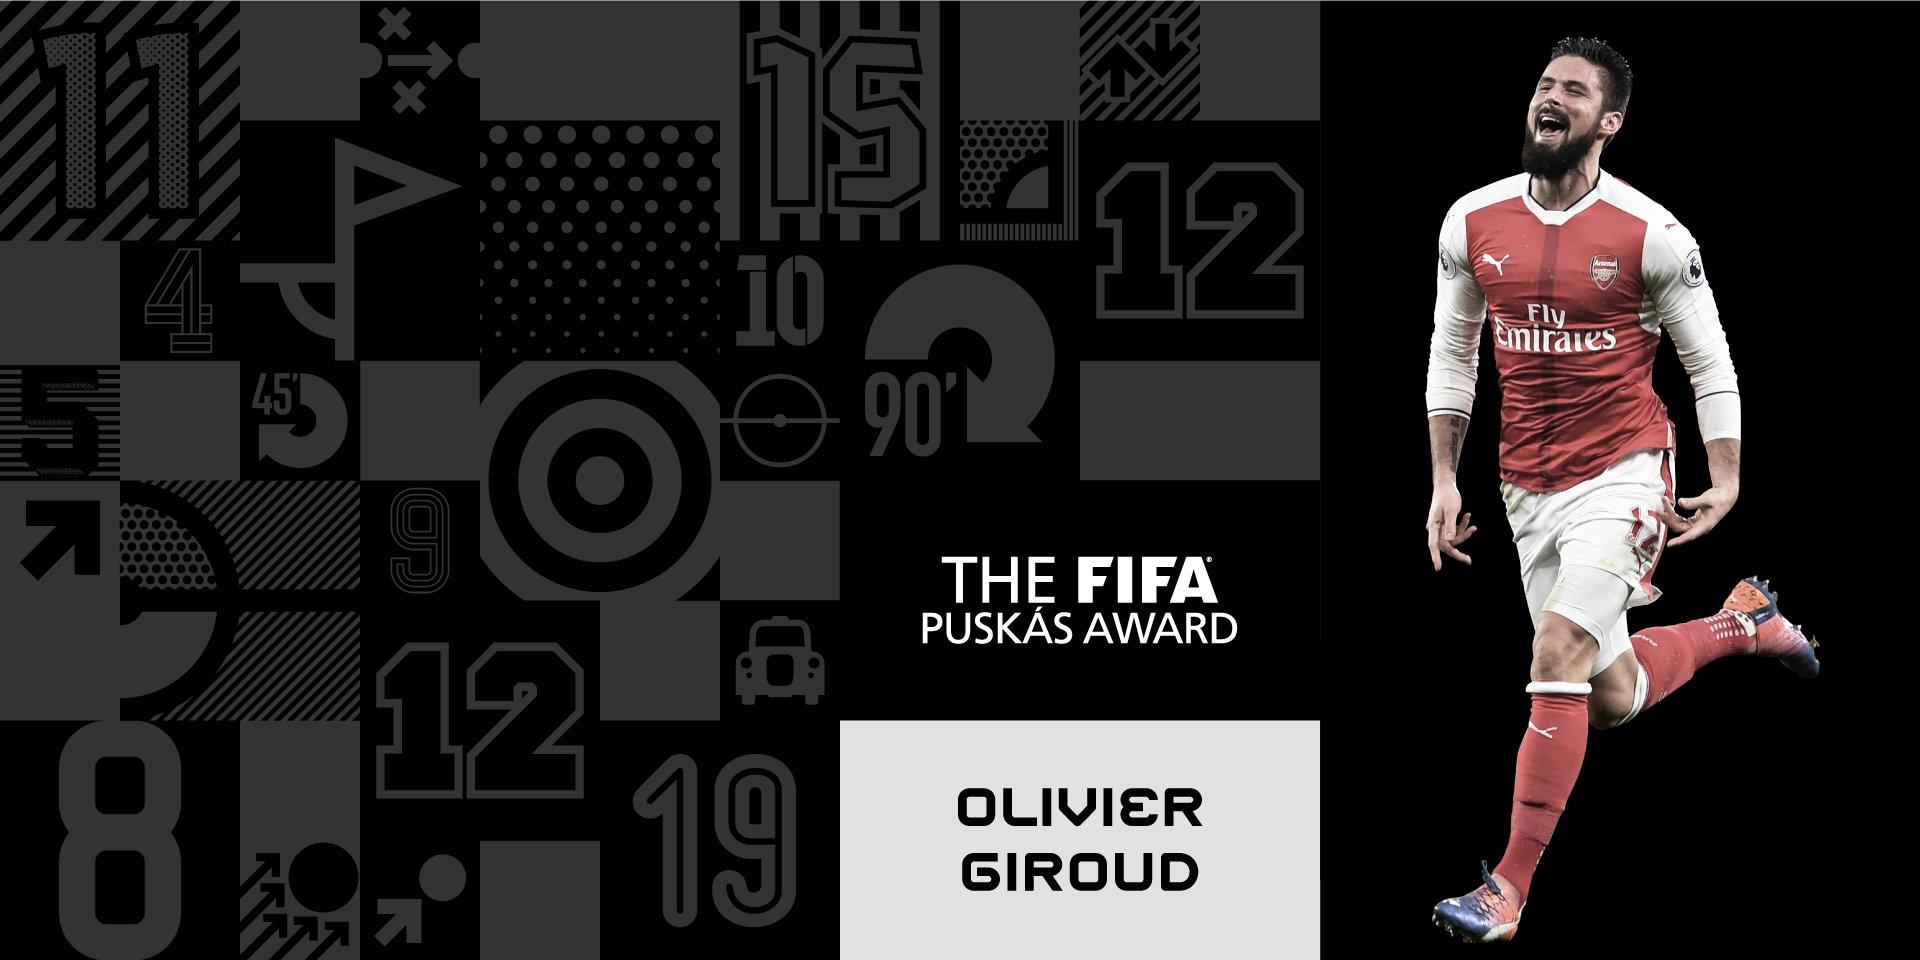 Congratulations, ����@_OlivierGiroud_! �� The Frenchman's scorpion kick wins the FIFA #Puskás Award 2017 ���� #TheBest https://t.co/xA69neDfoO